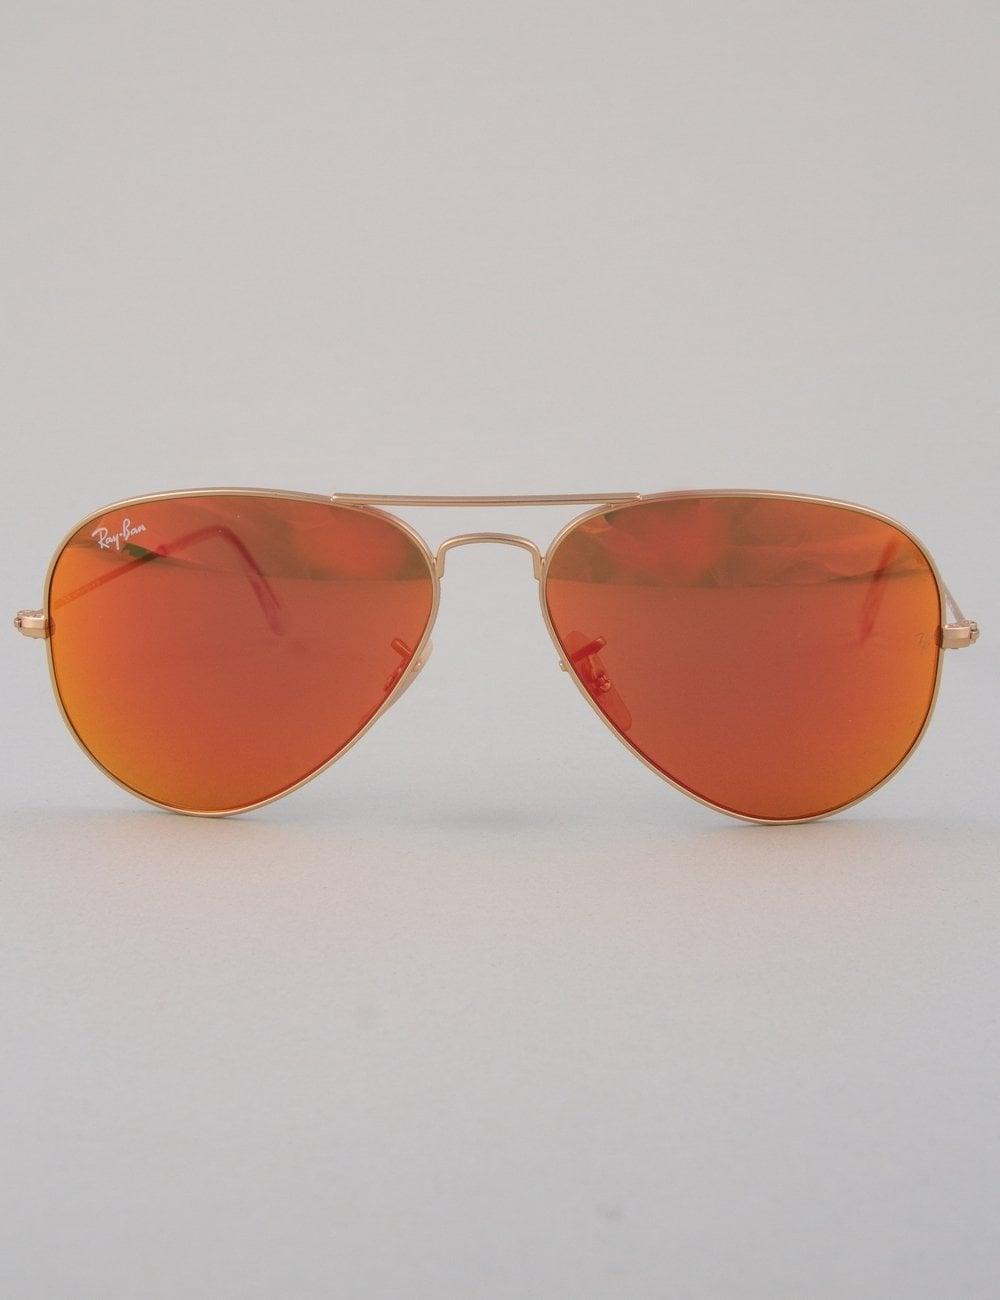 62bb70a23be Ray-Ban Aviator Large Sunglasses - Matte Gold